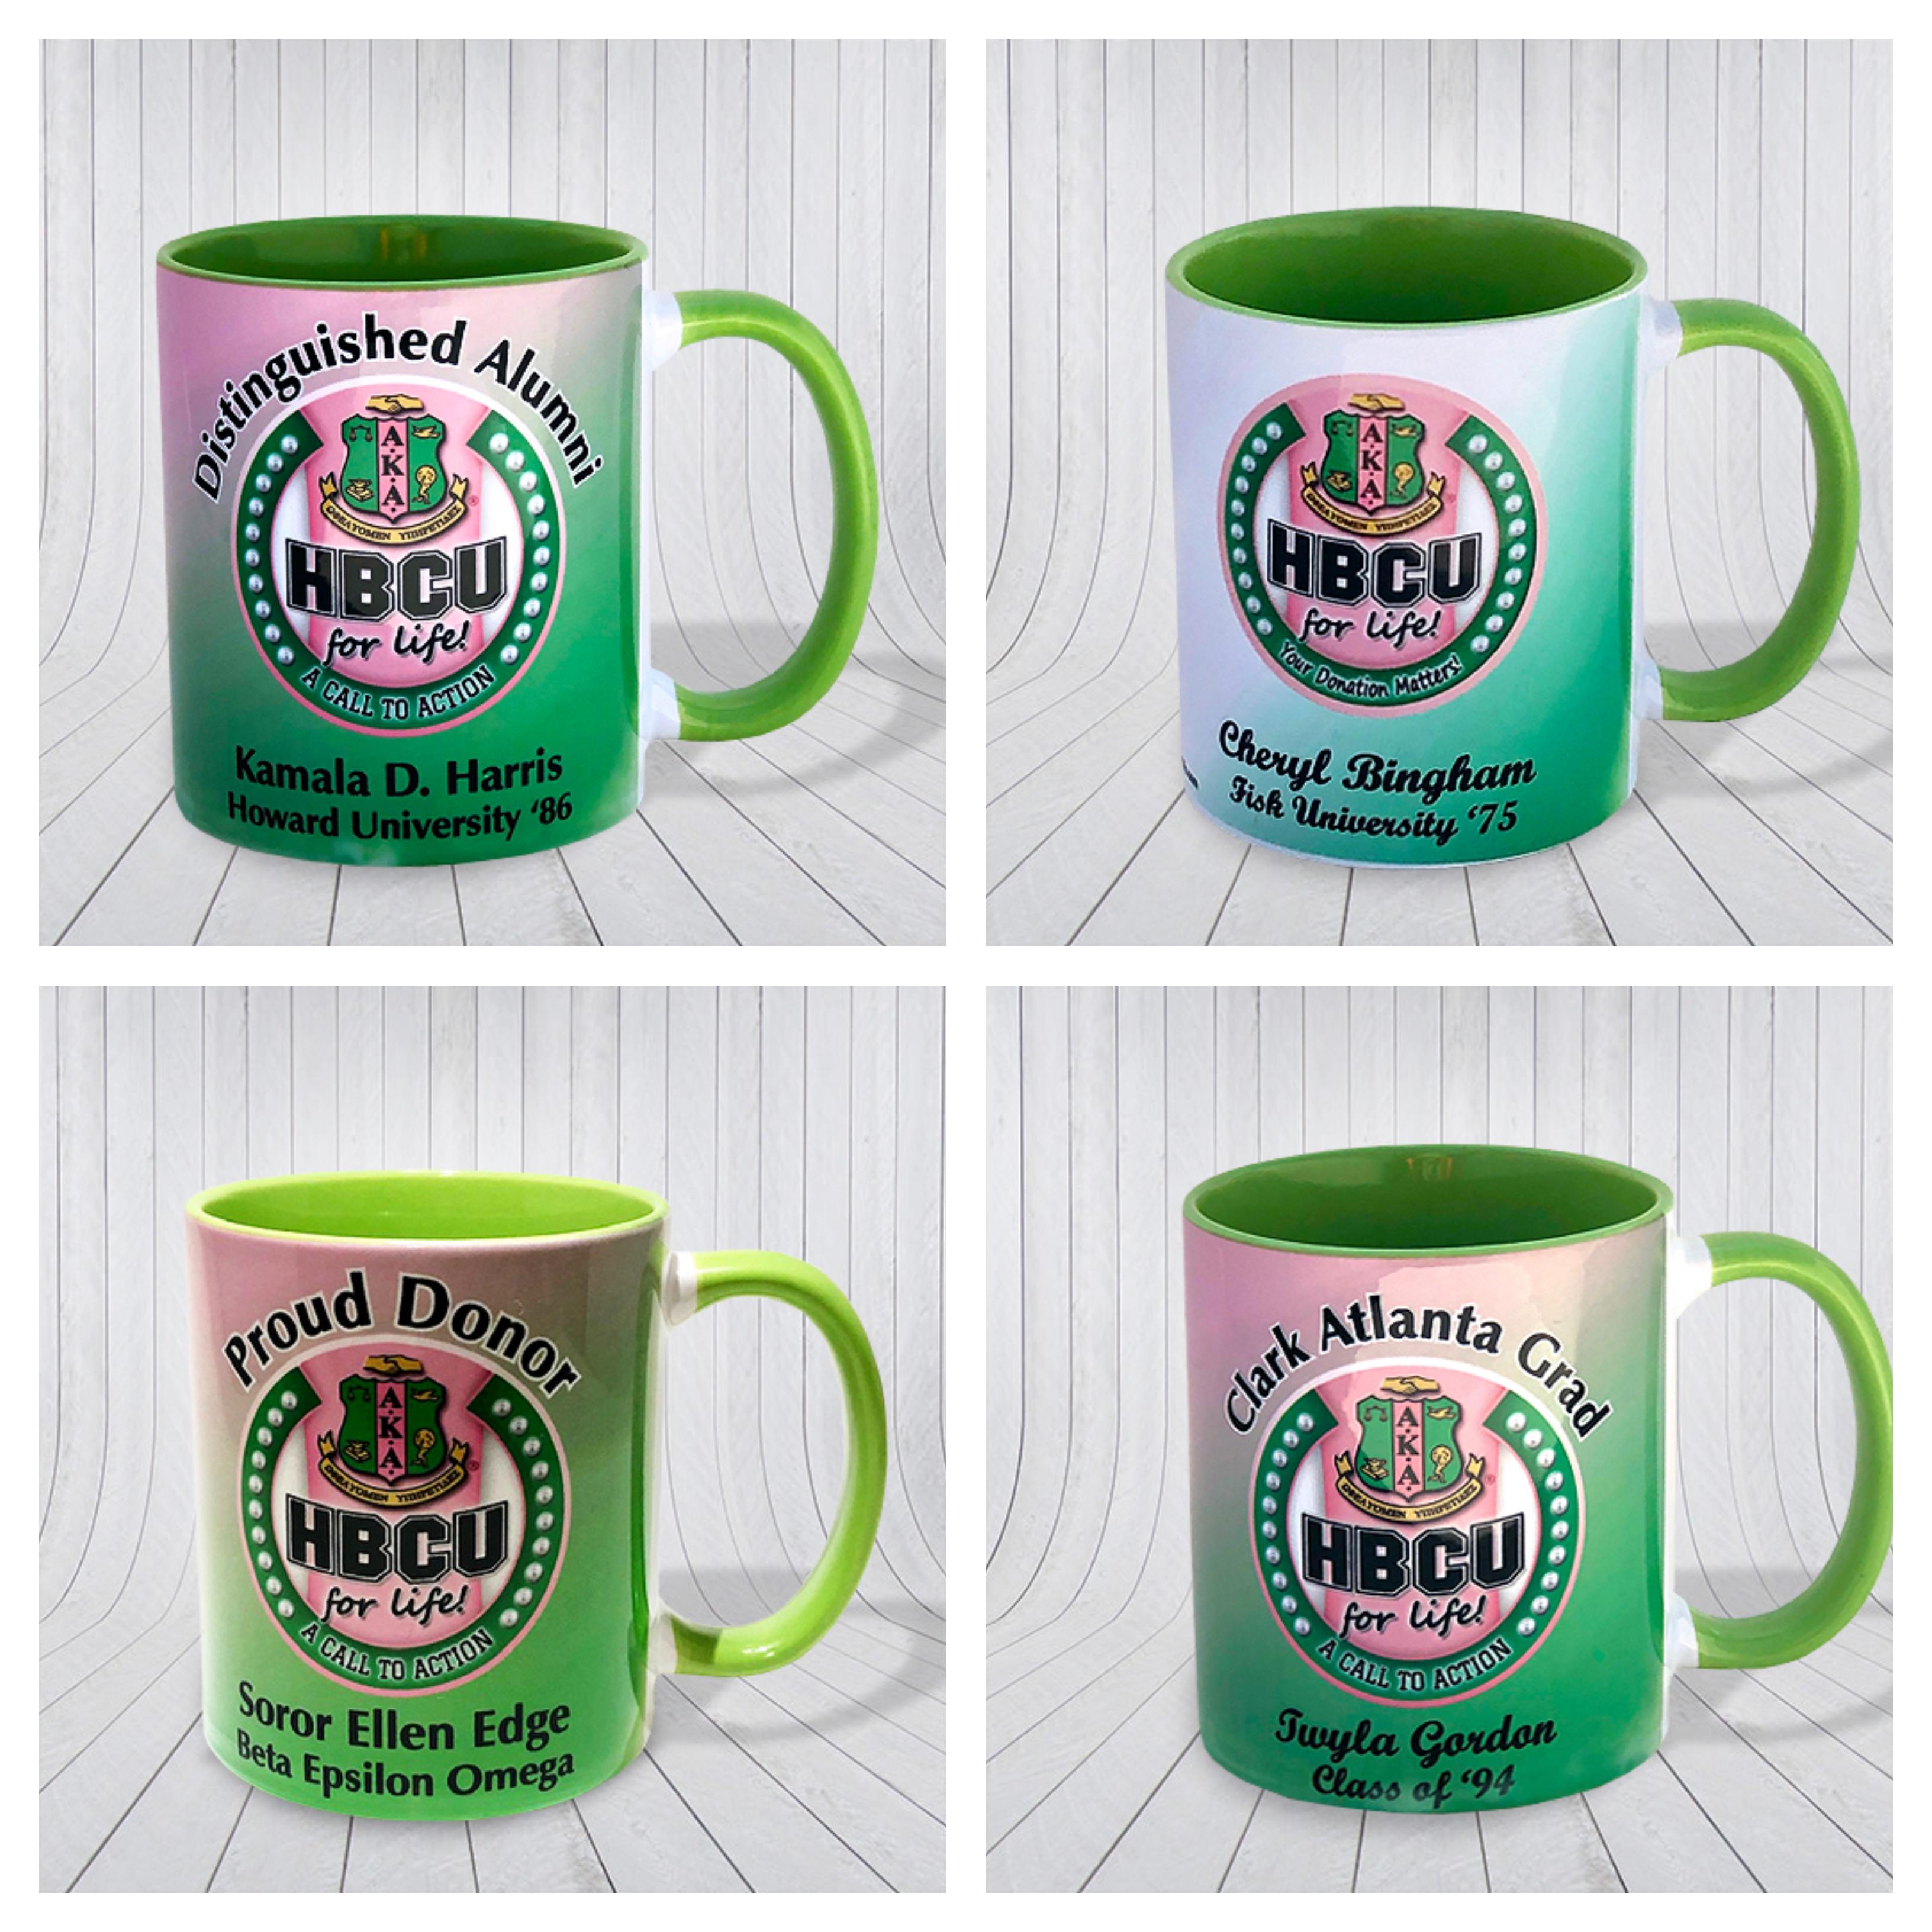 hbcu-mug-4-x-4.jpg